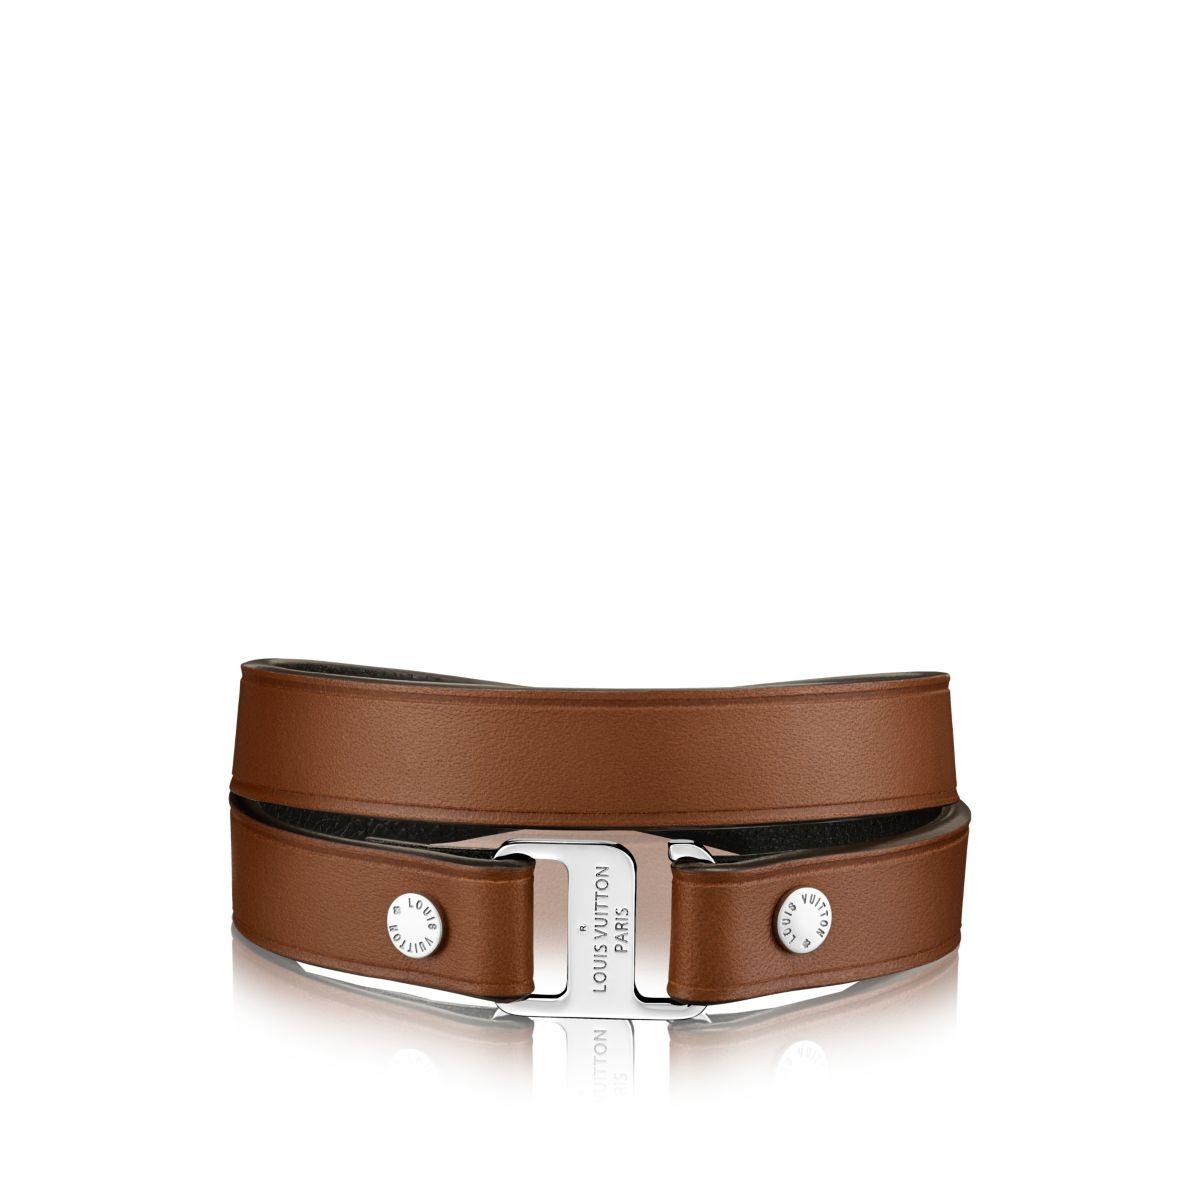 Louis Vuitton Snap It 12 Mm Bracelet In Brown For Men